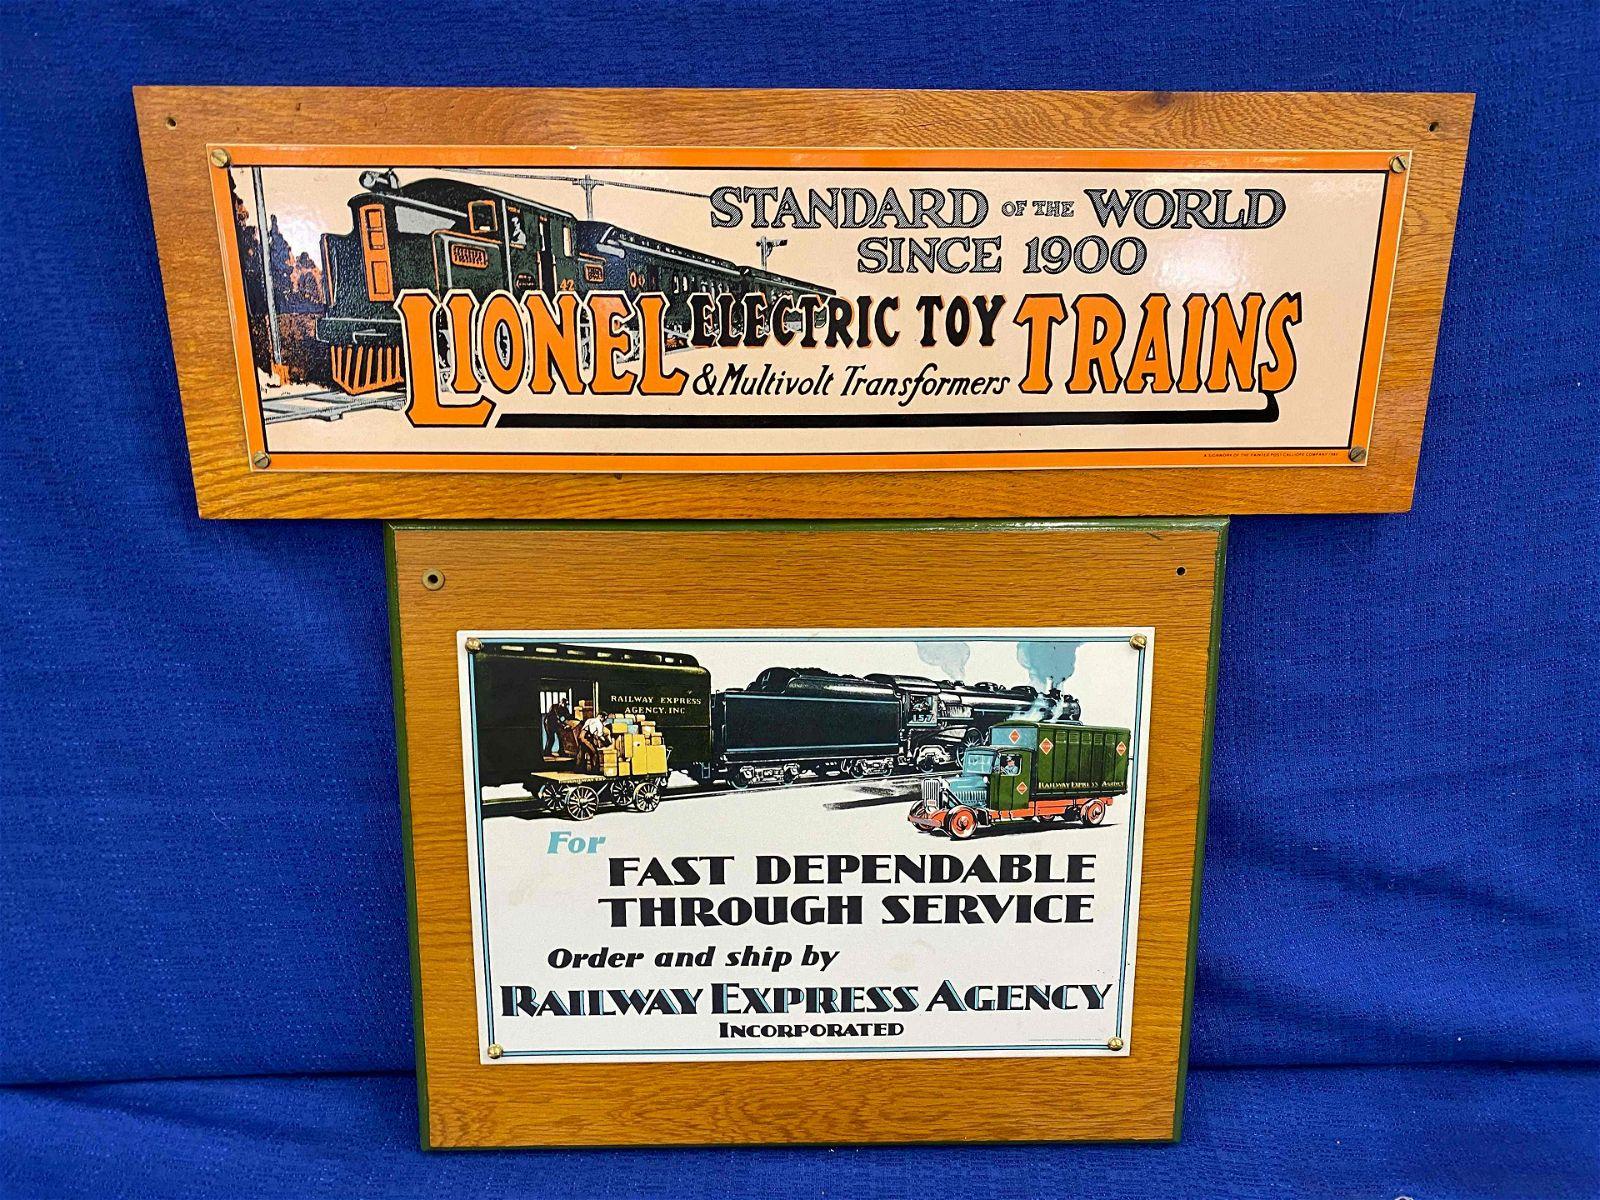 2 Tin Railway Signs Mounted on Wood